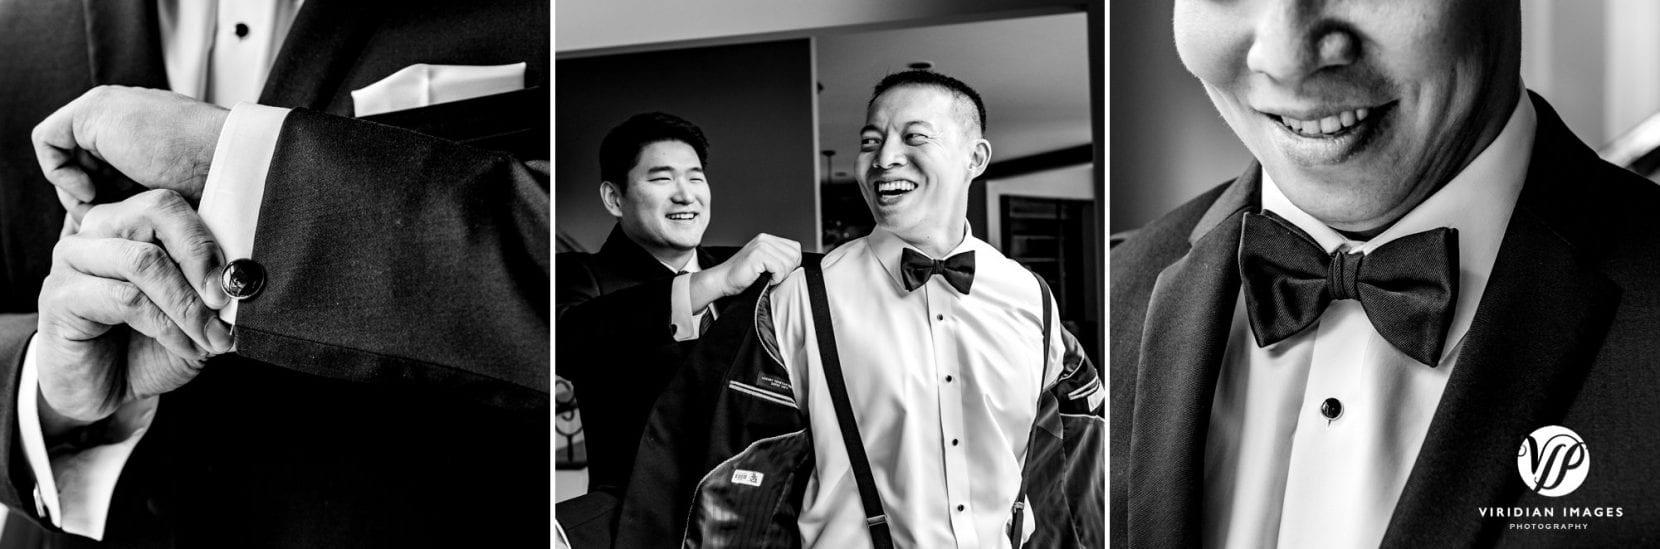 groom and groomsmen jacket on